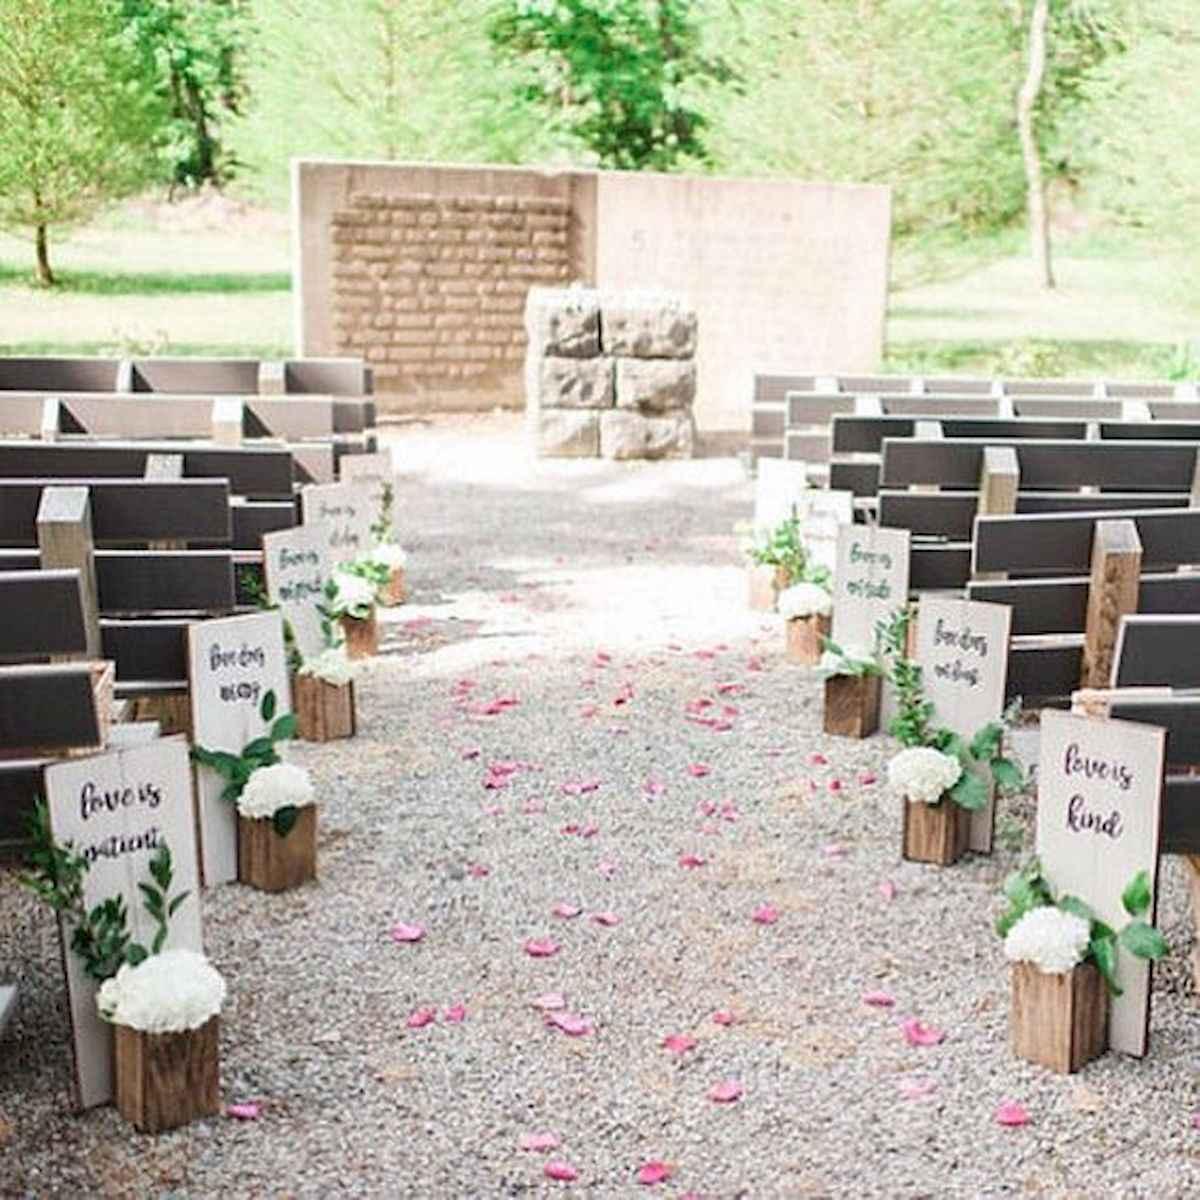 40 awesome backyard wedding decor ideas (36)